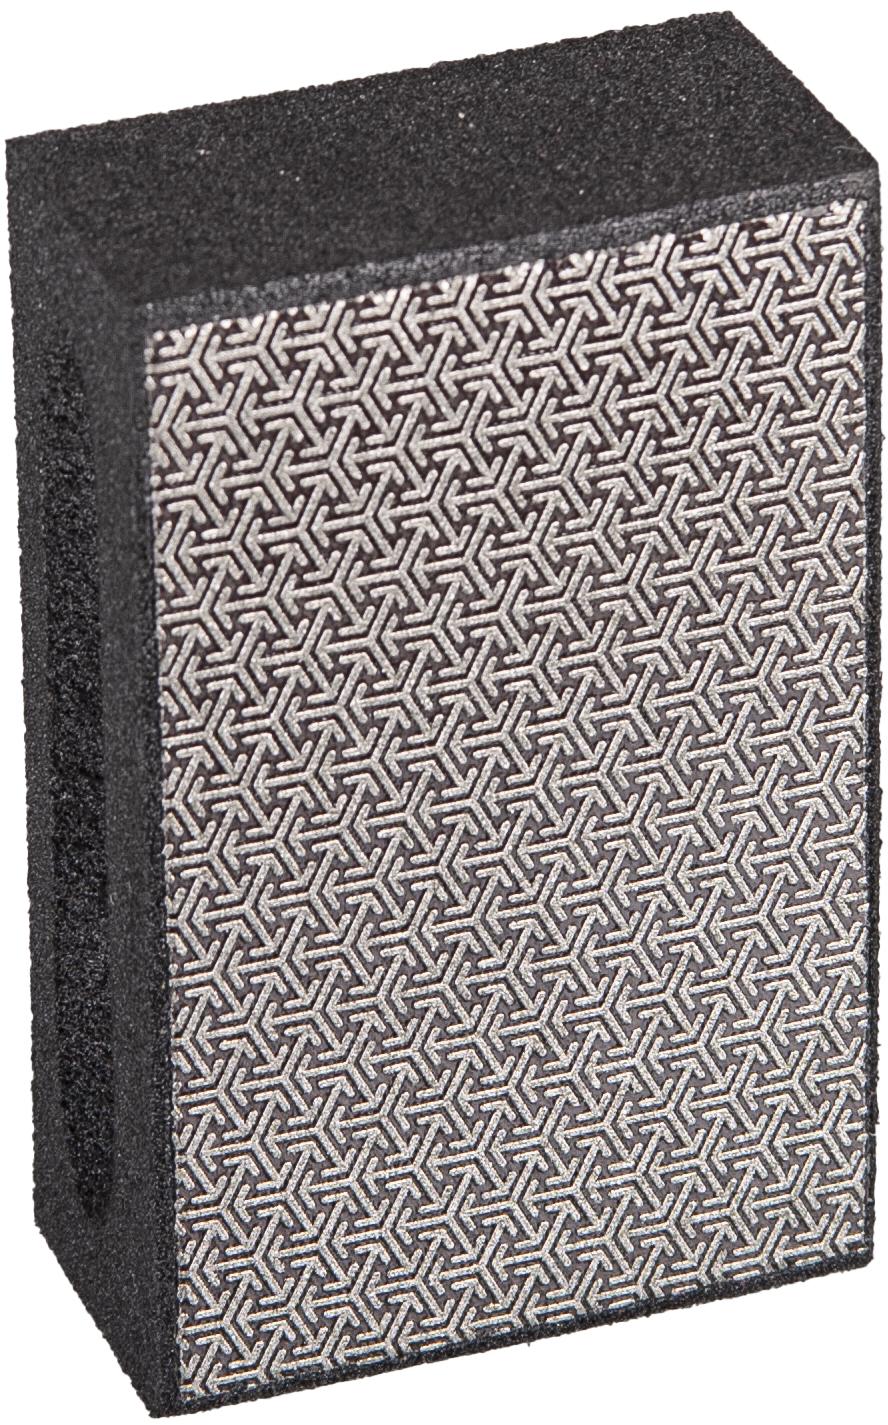 Telum Handpad 90 x 55 mm │ Korn 120